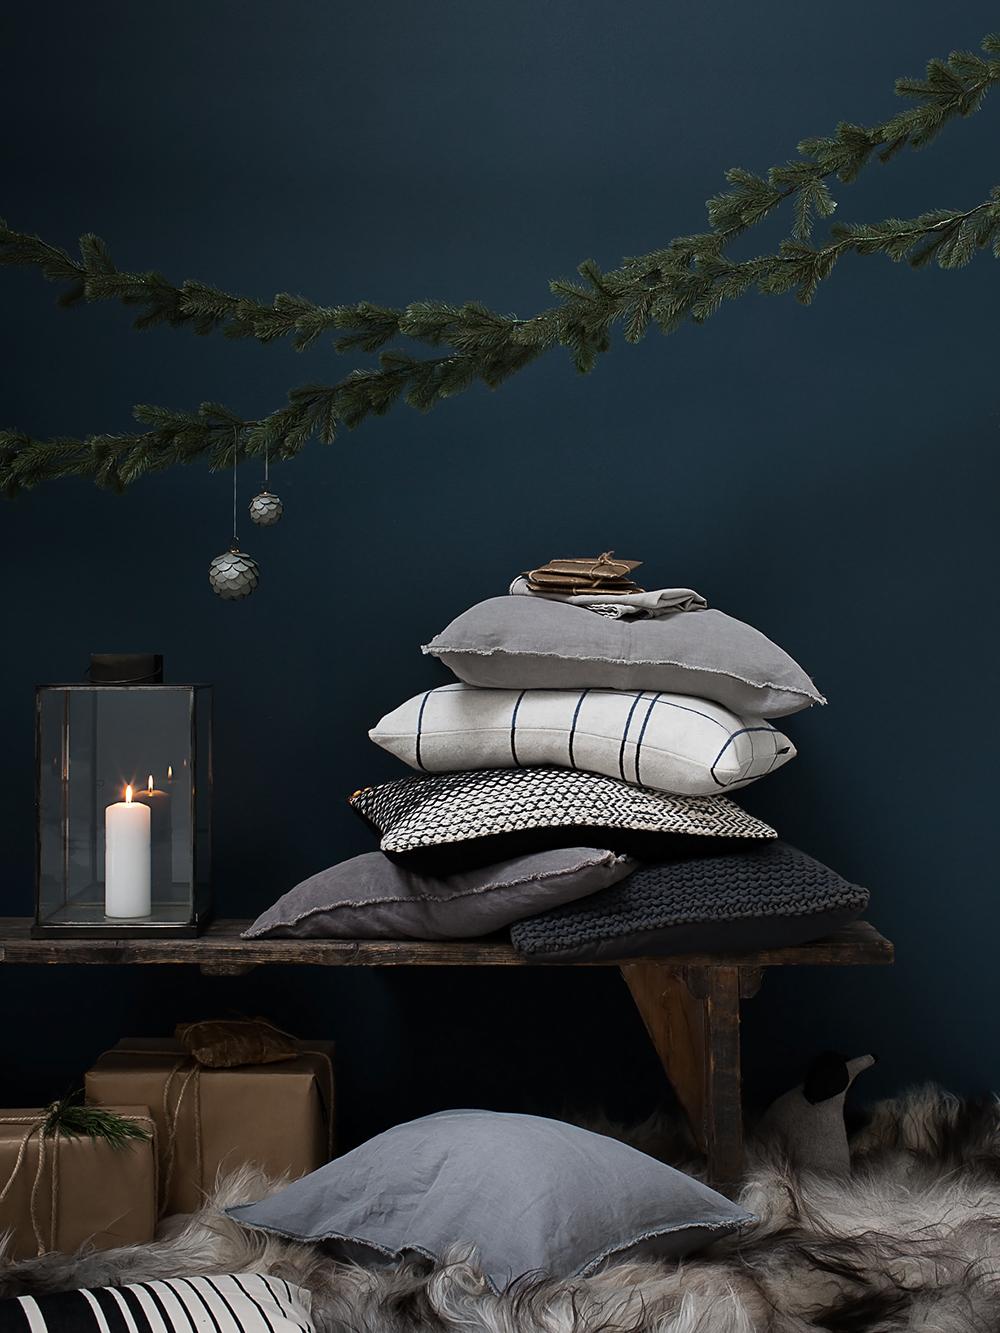 Julbild textil_kuddar